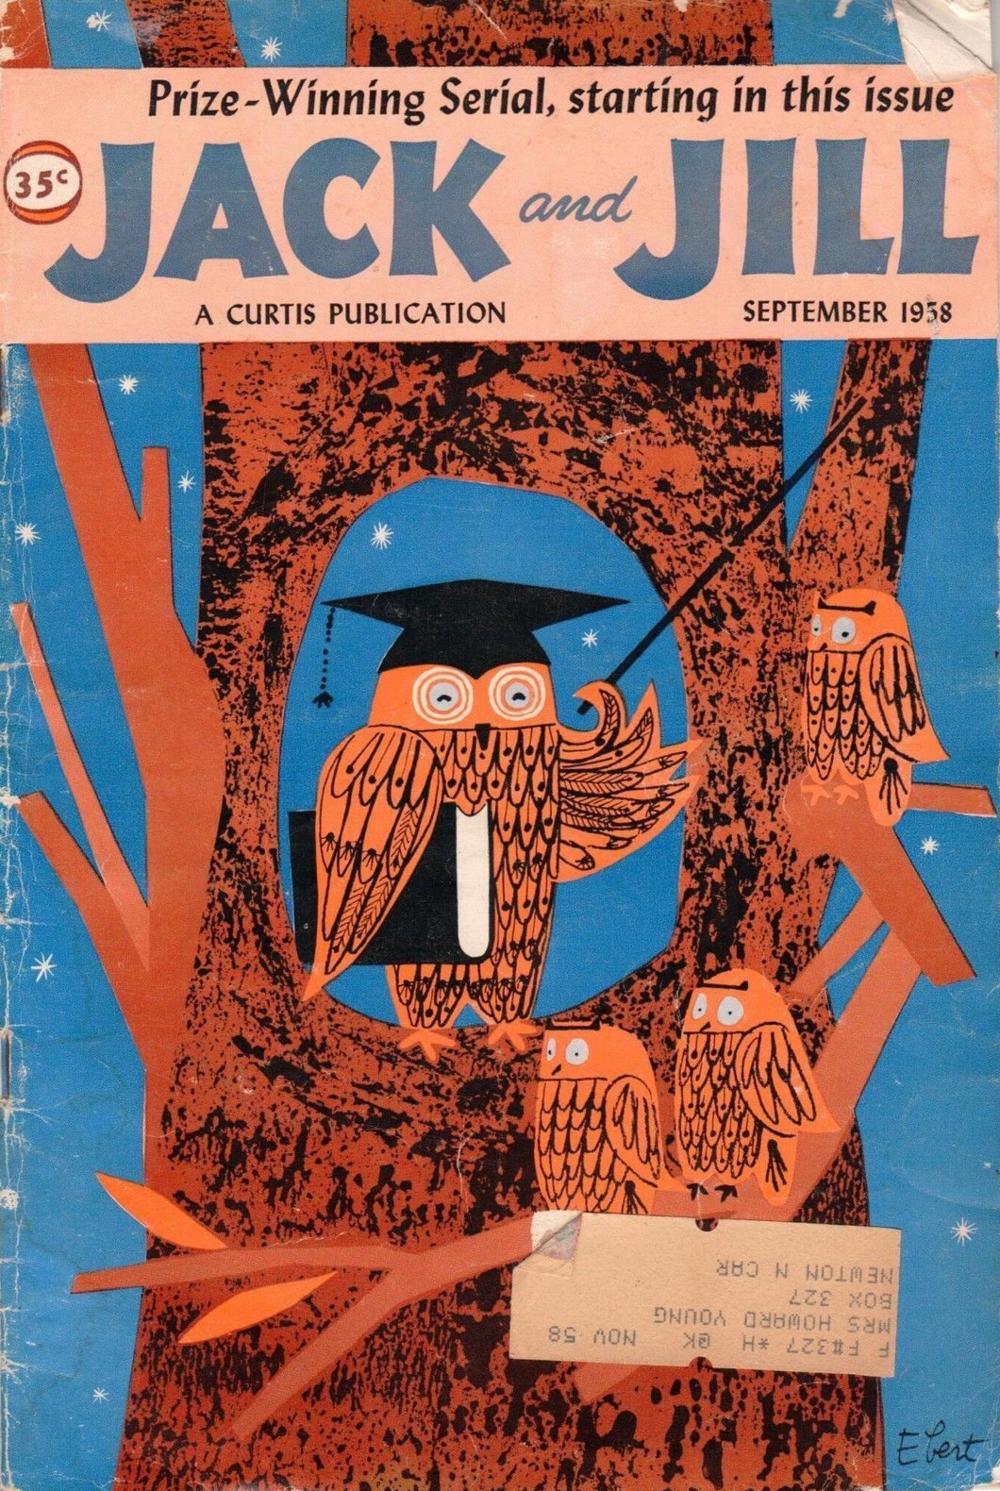 September 1958 via ebay